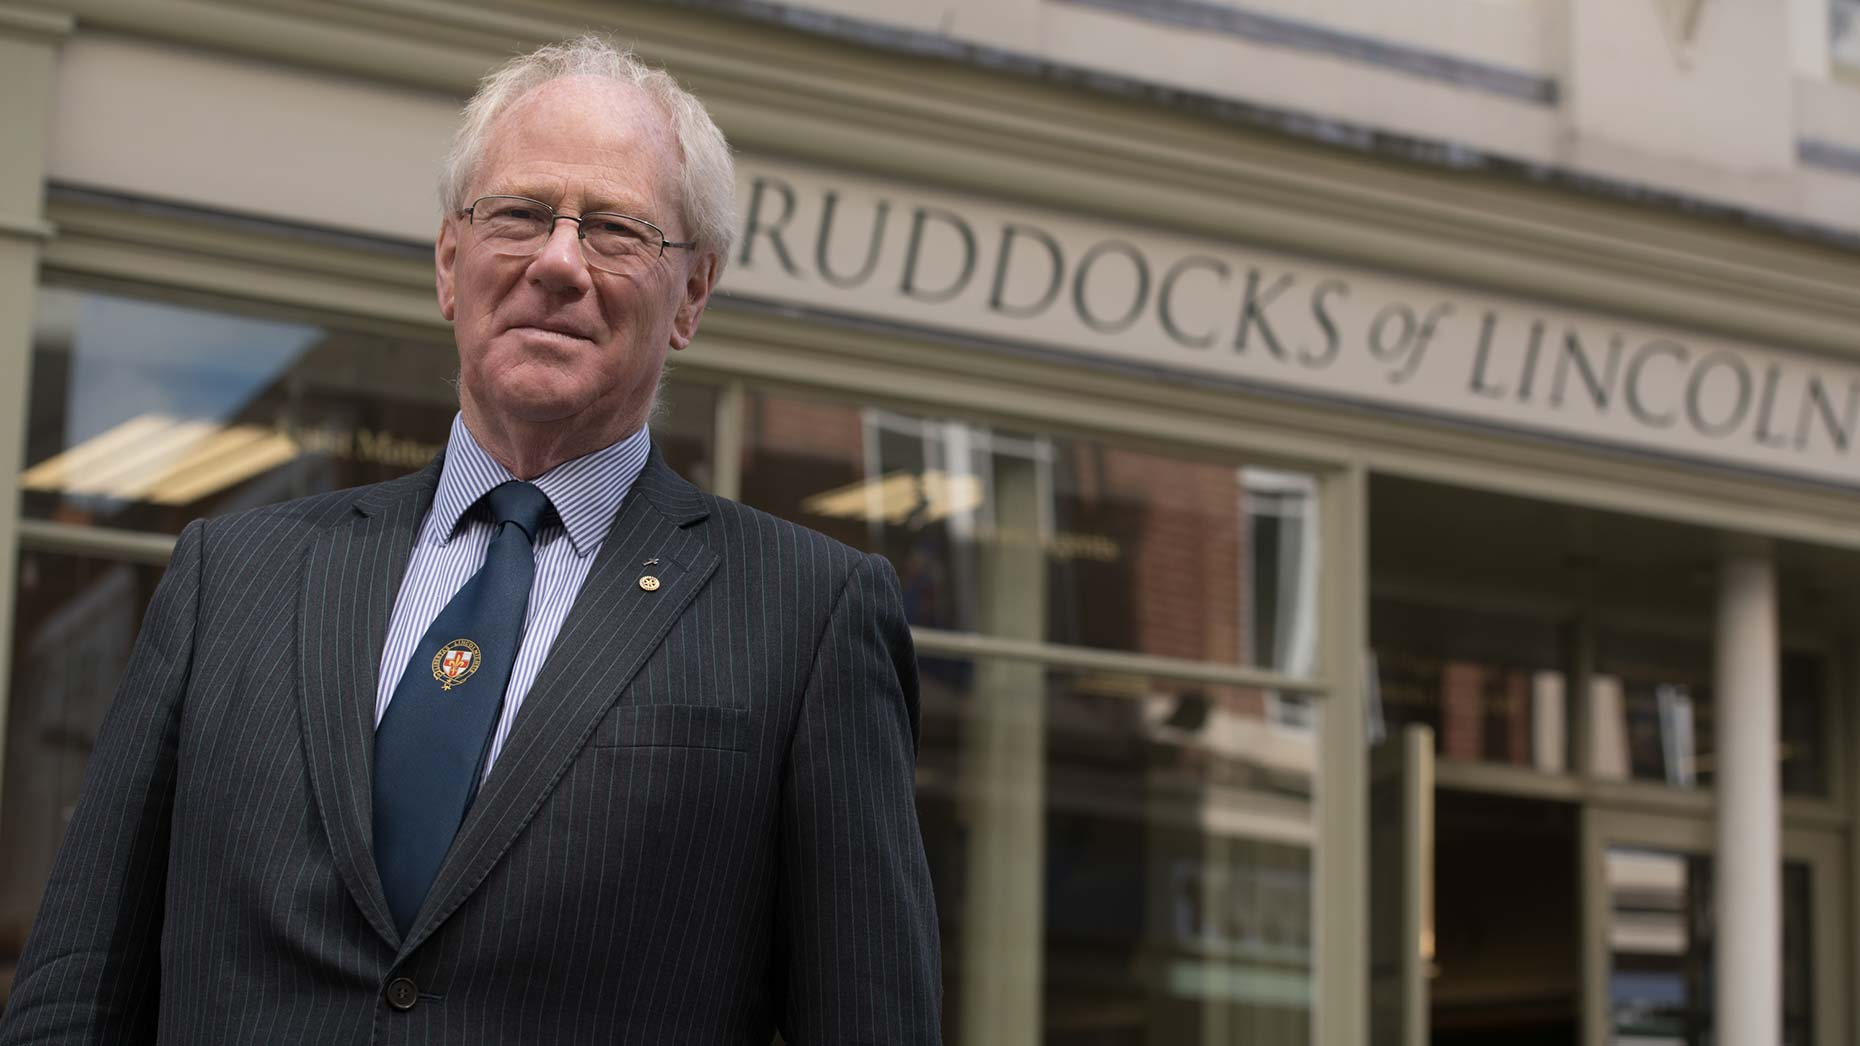 Henry Ruddock